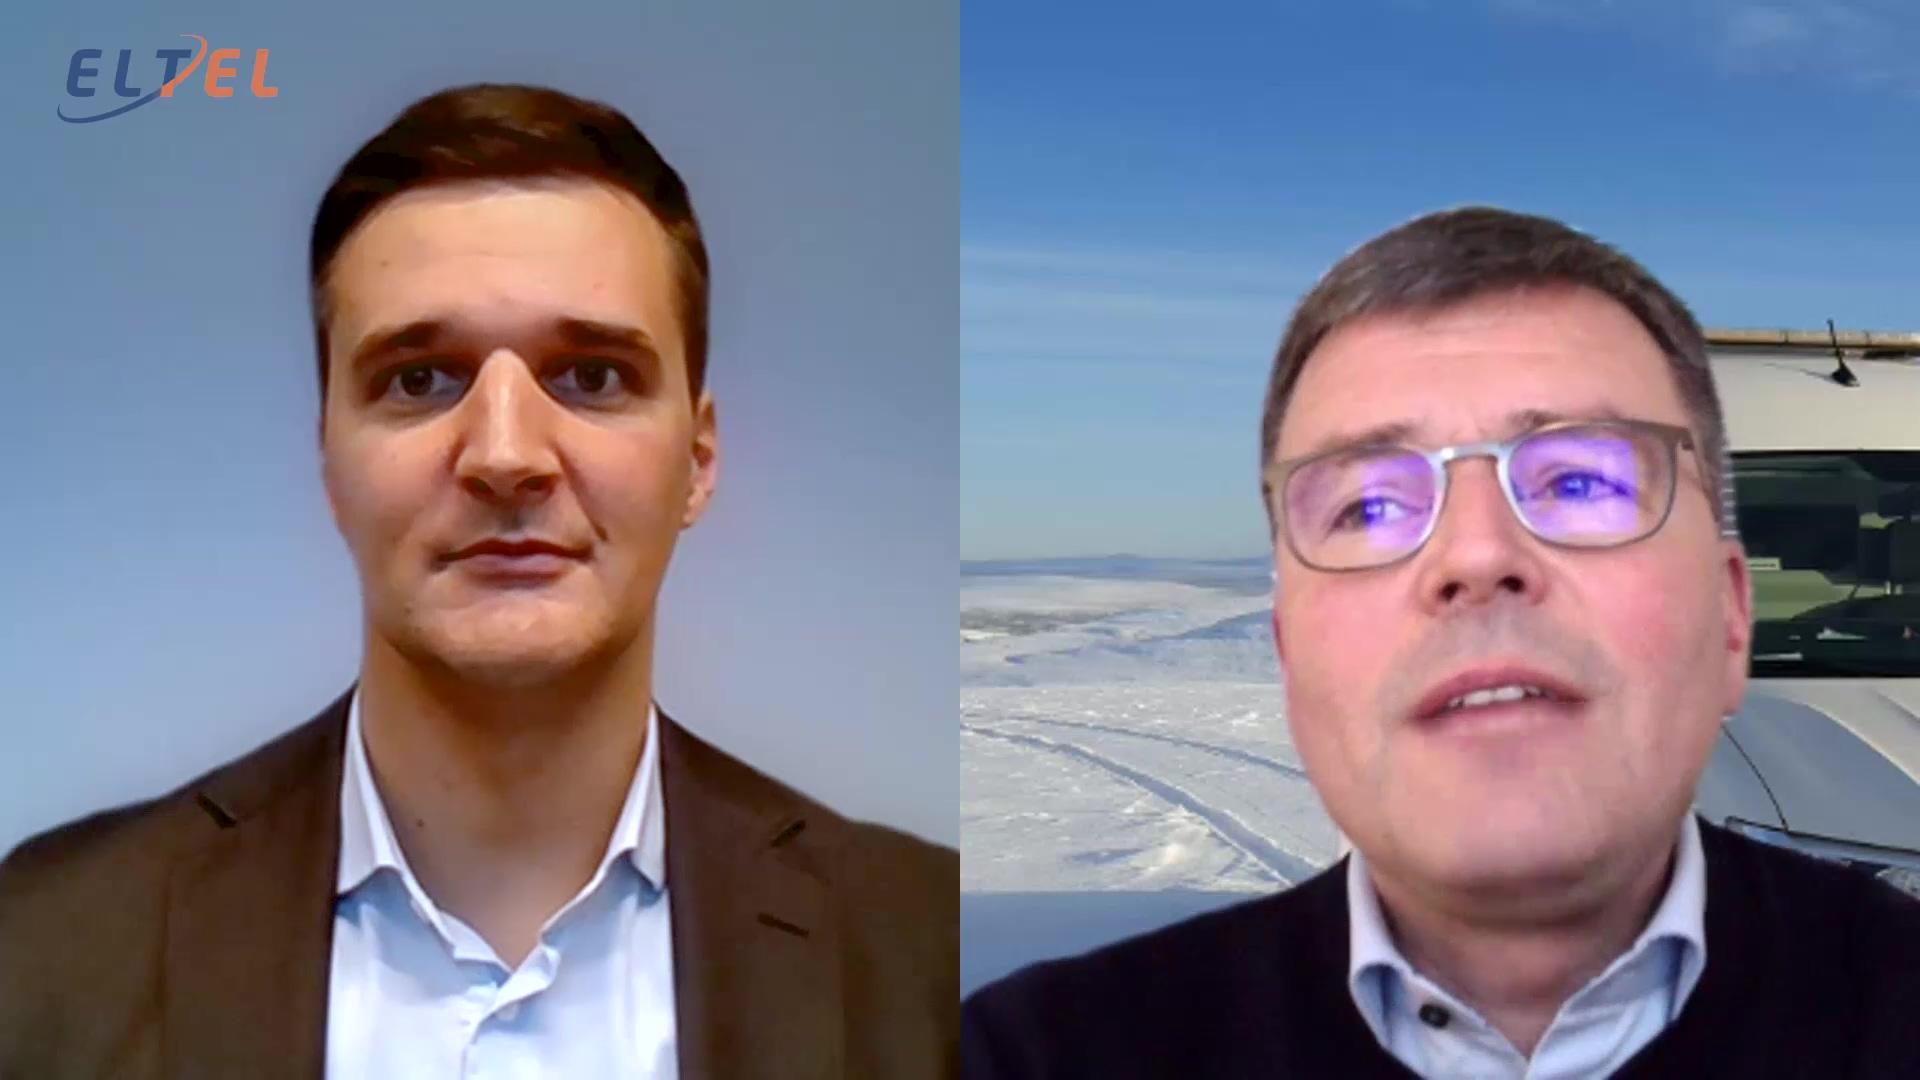 Eltel Q420 interview with CEO Casimir Lindholm